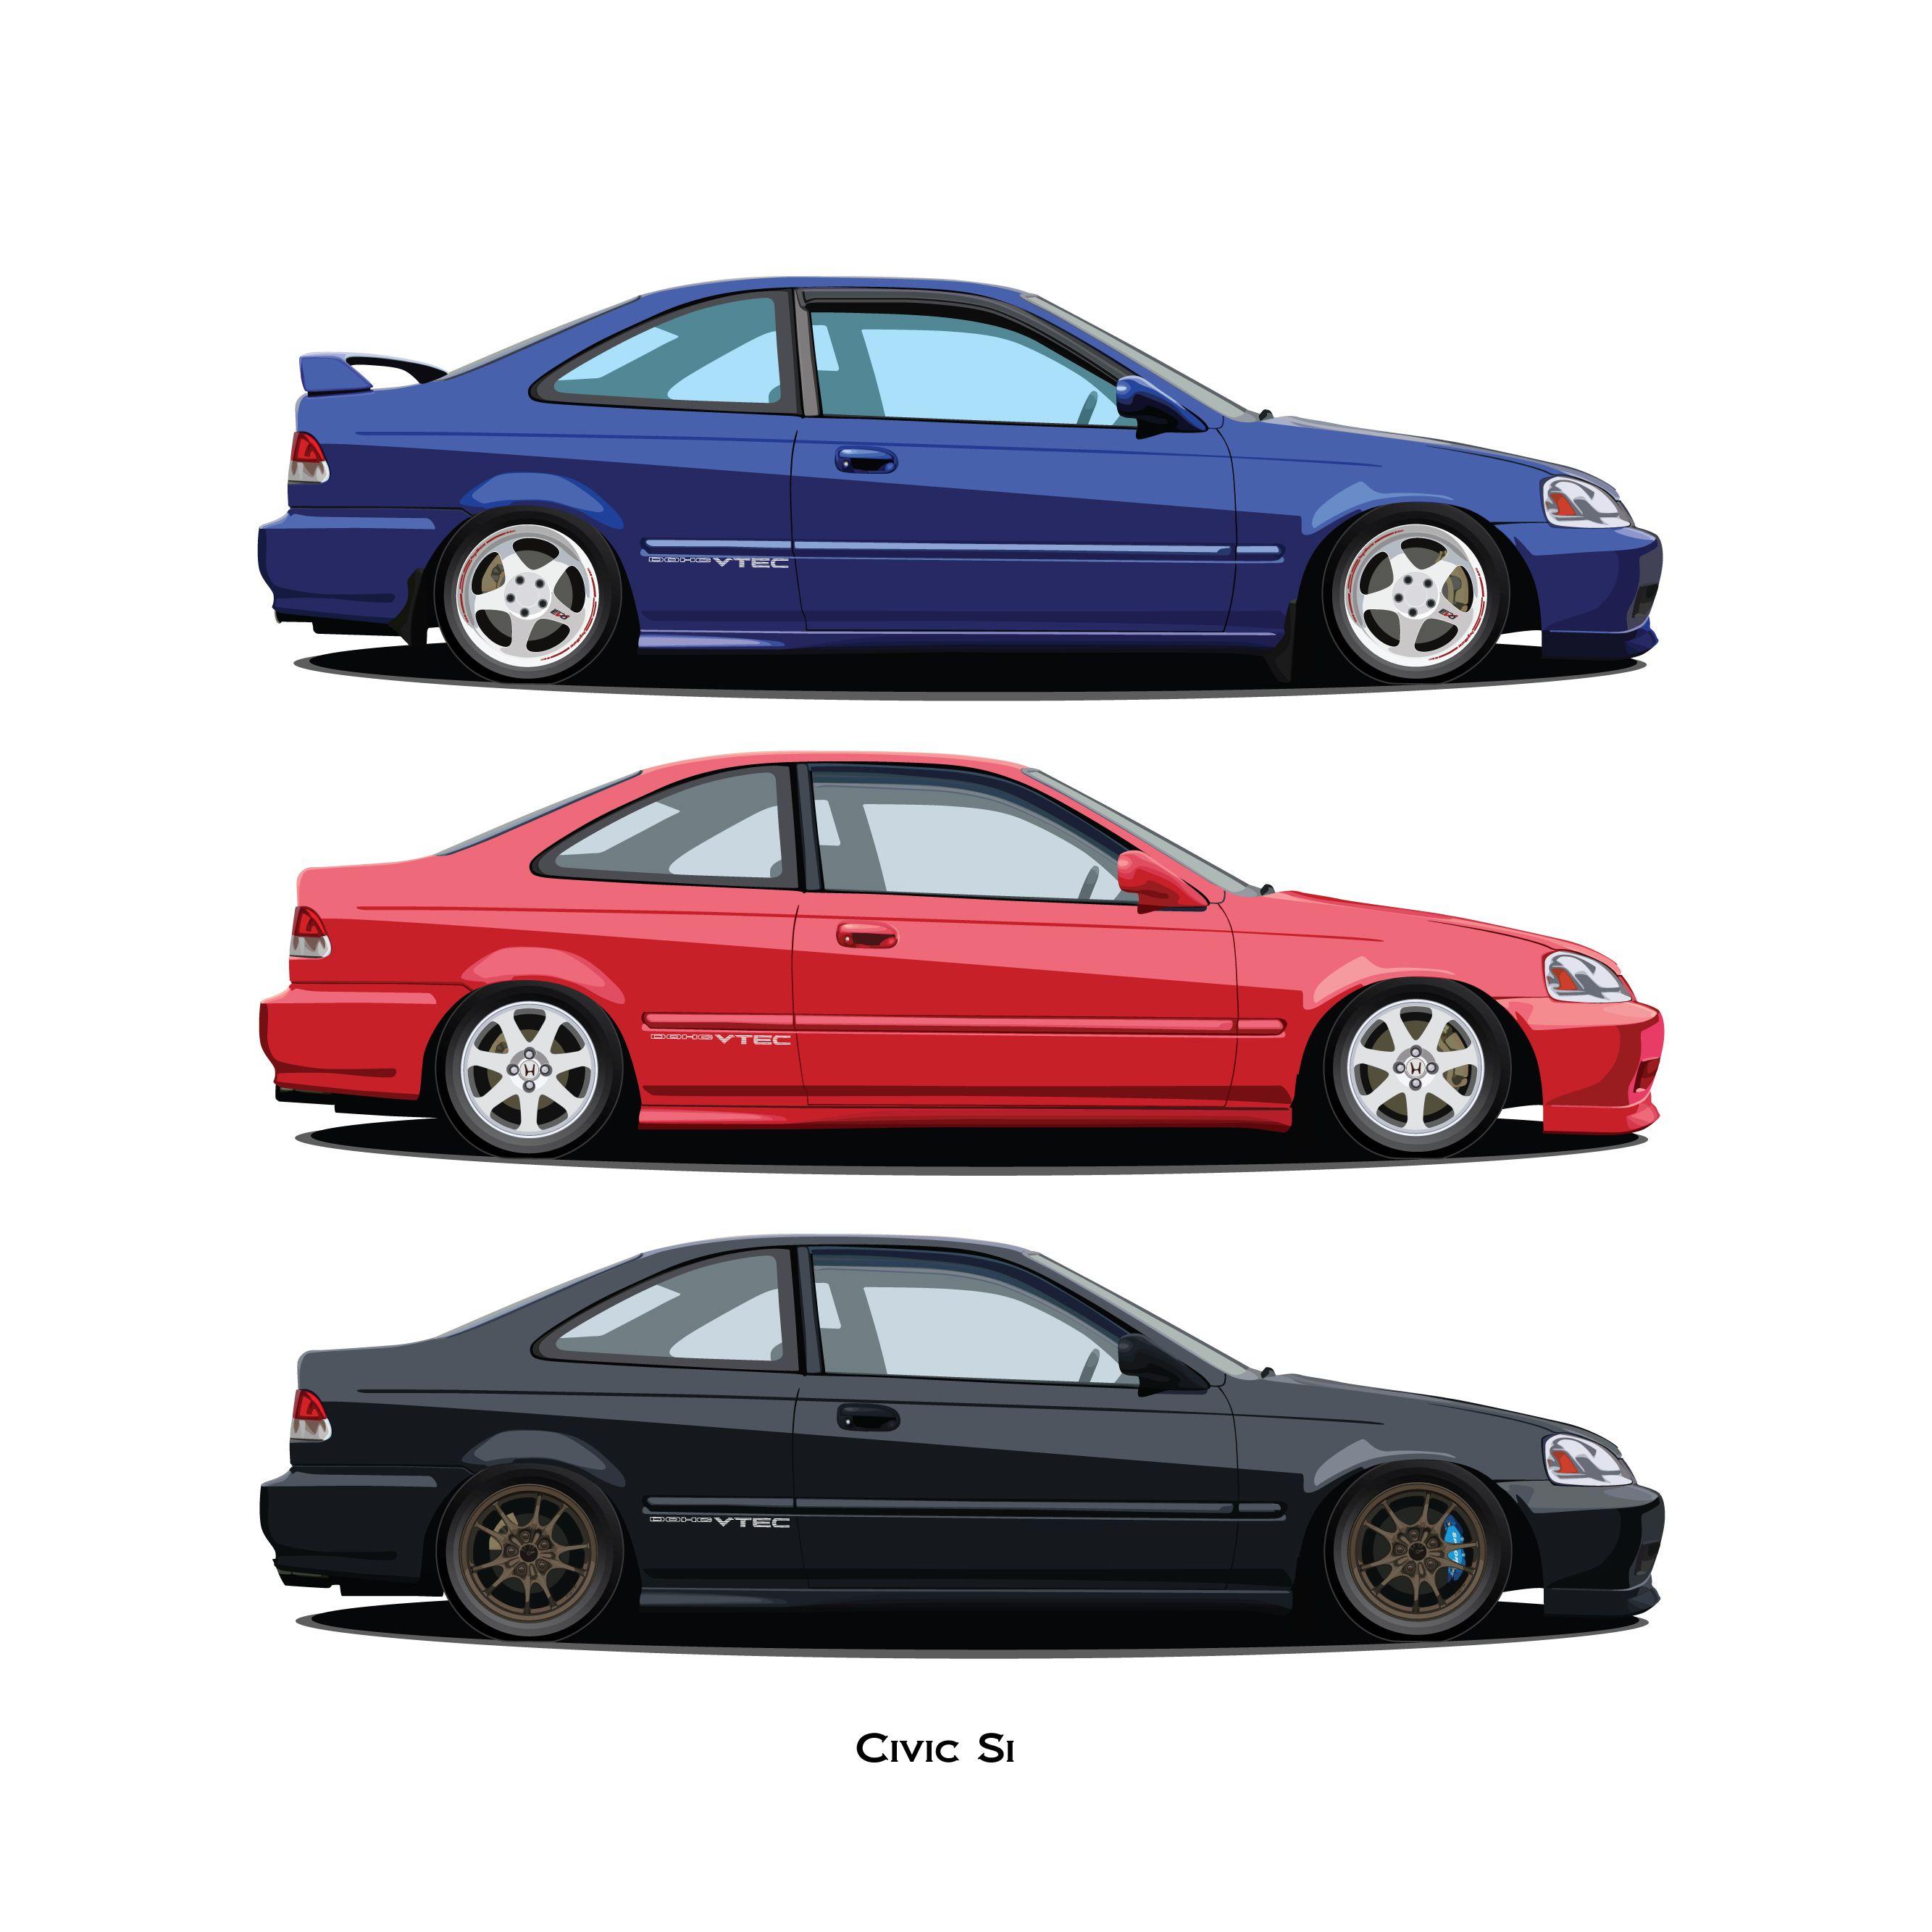 99 Civic Sedan: 1999 Honda Civic Si And Friends Print